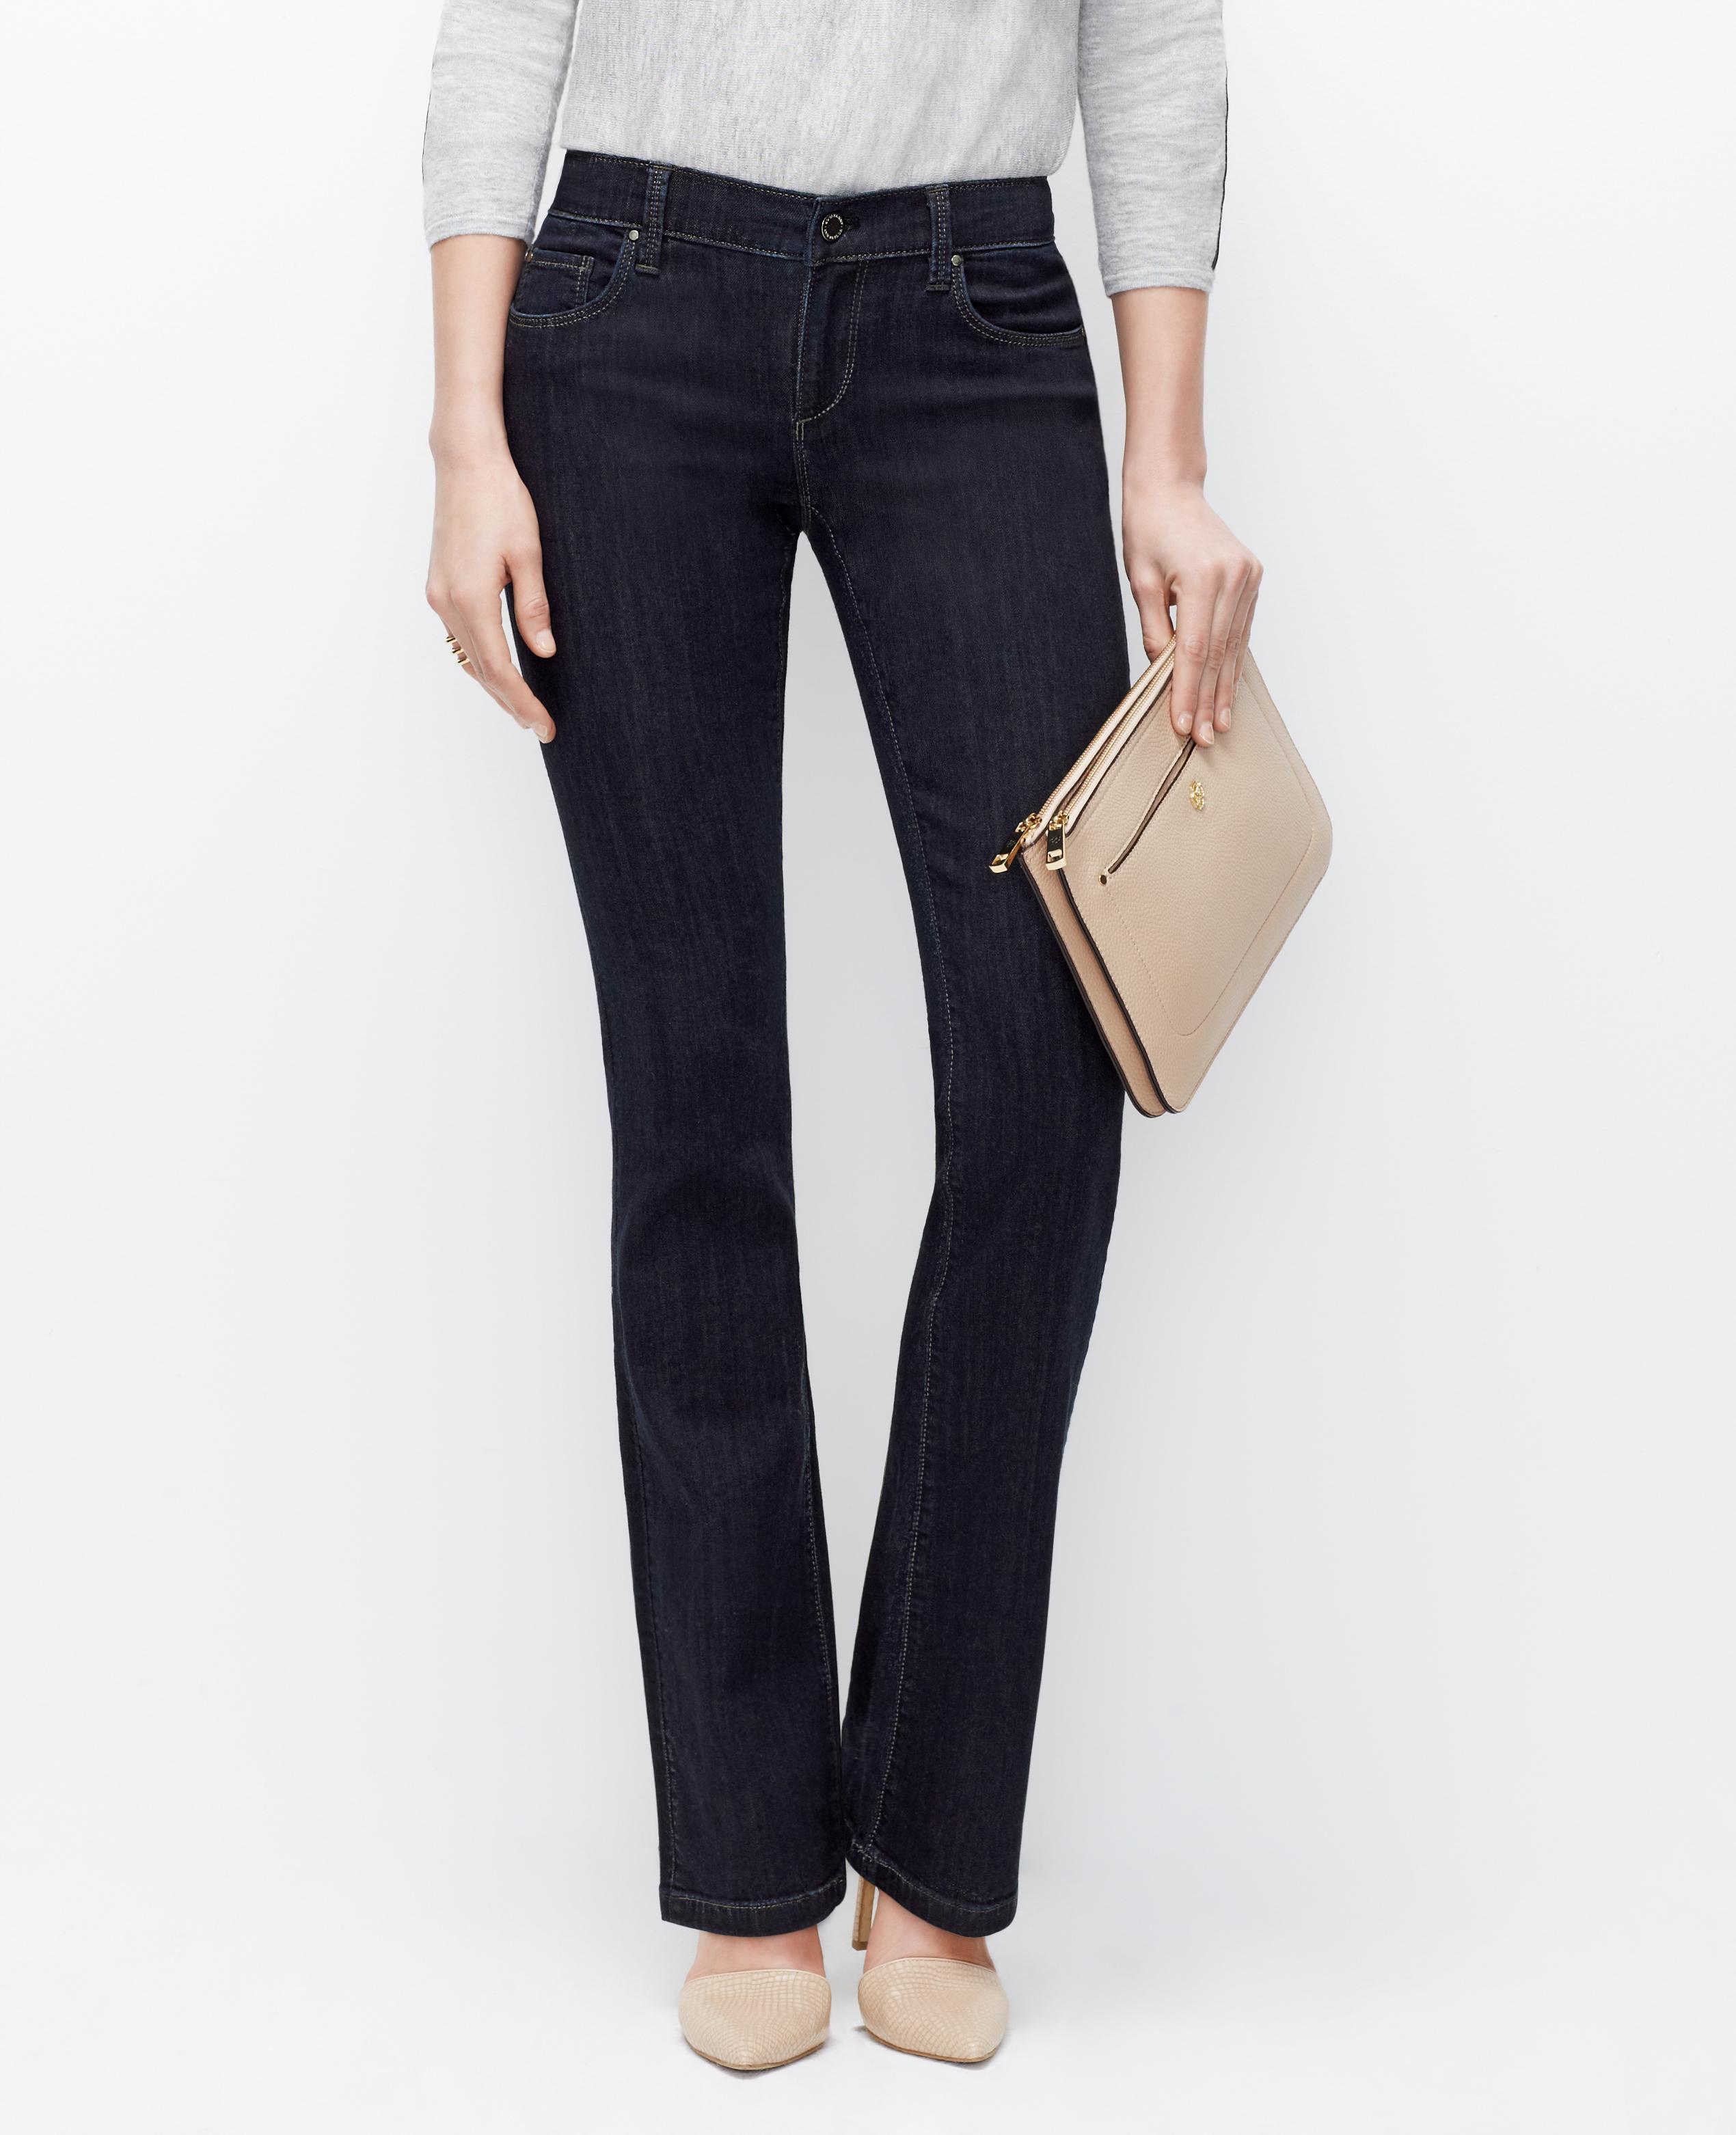 Modern baby bootleg jeans